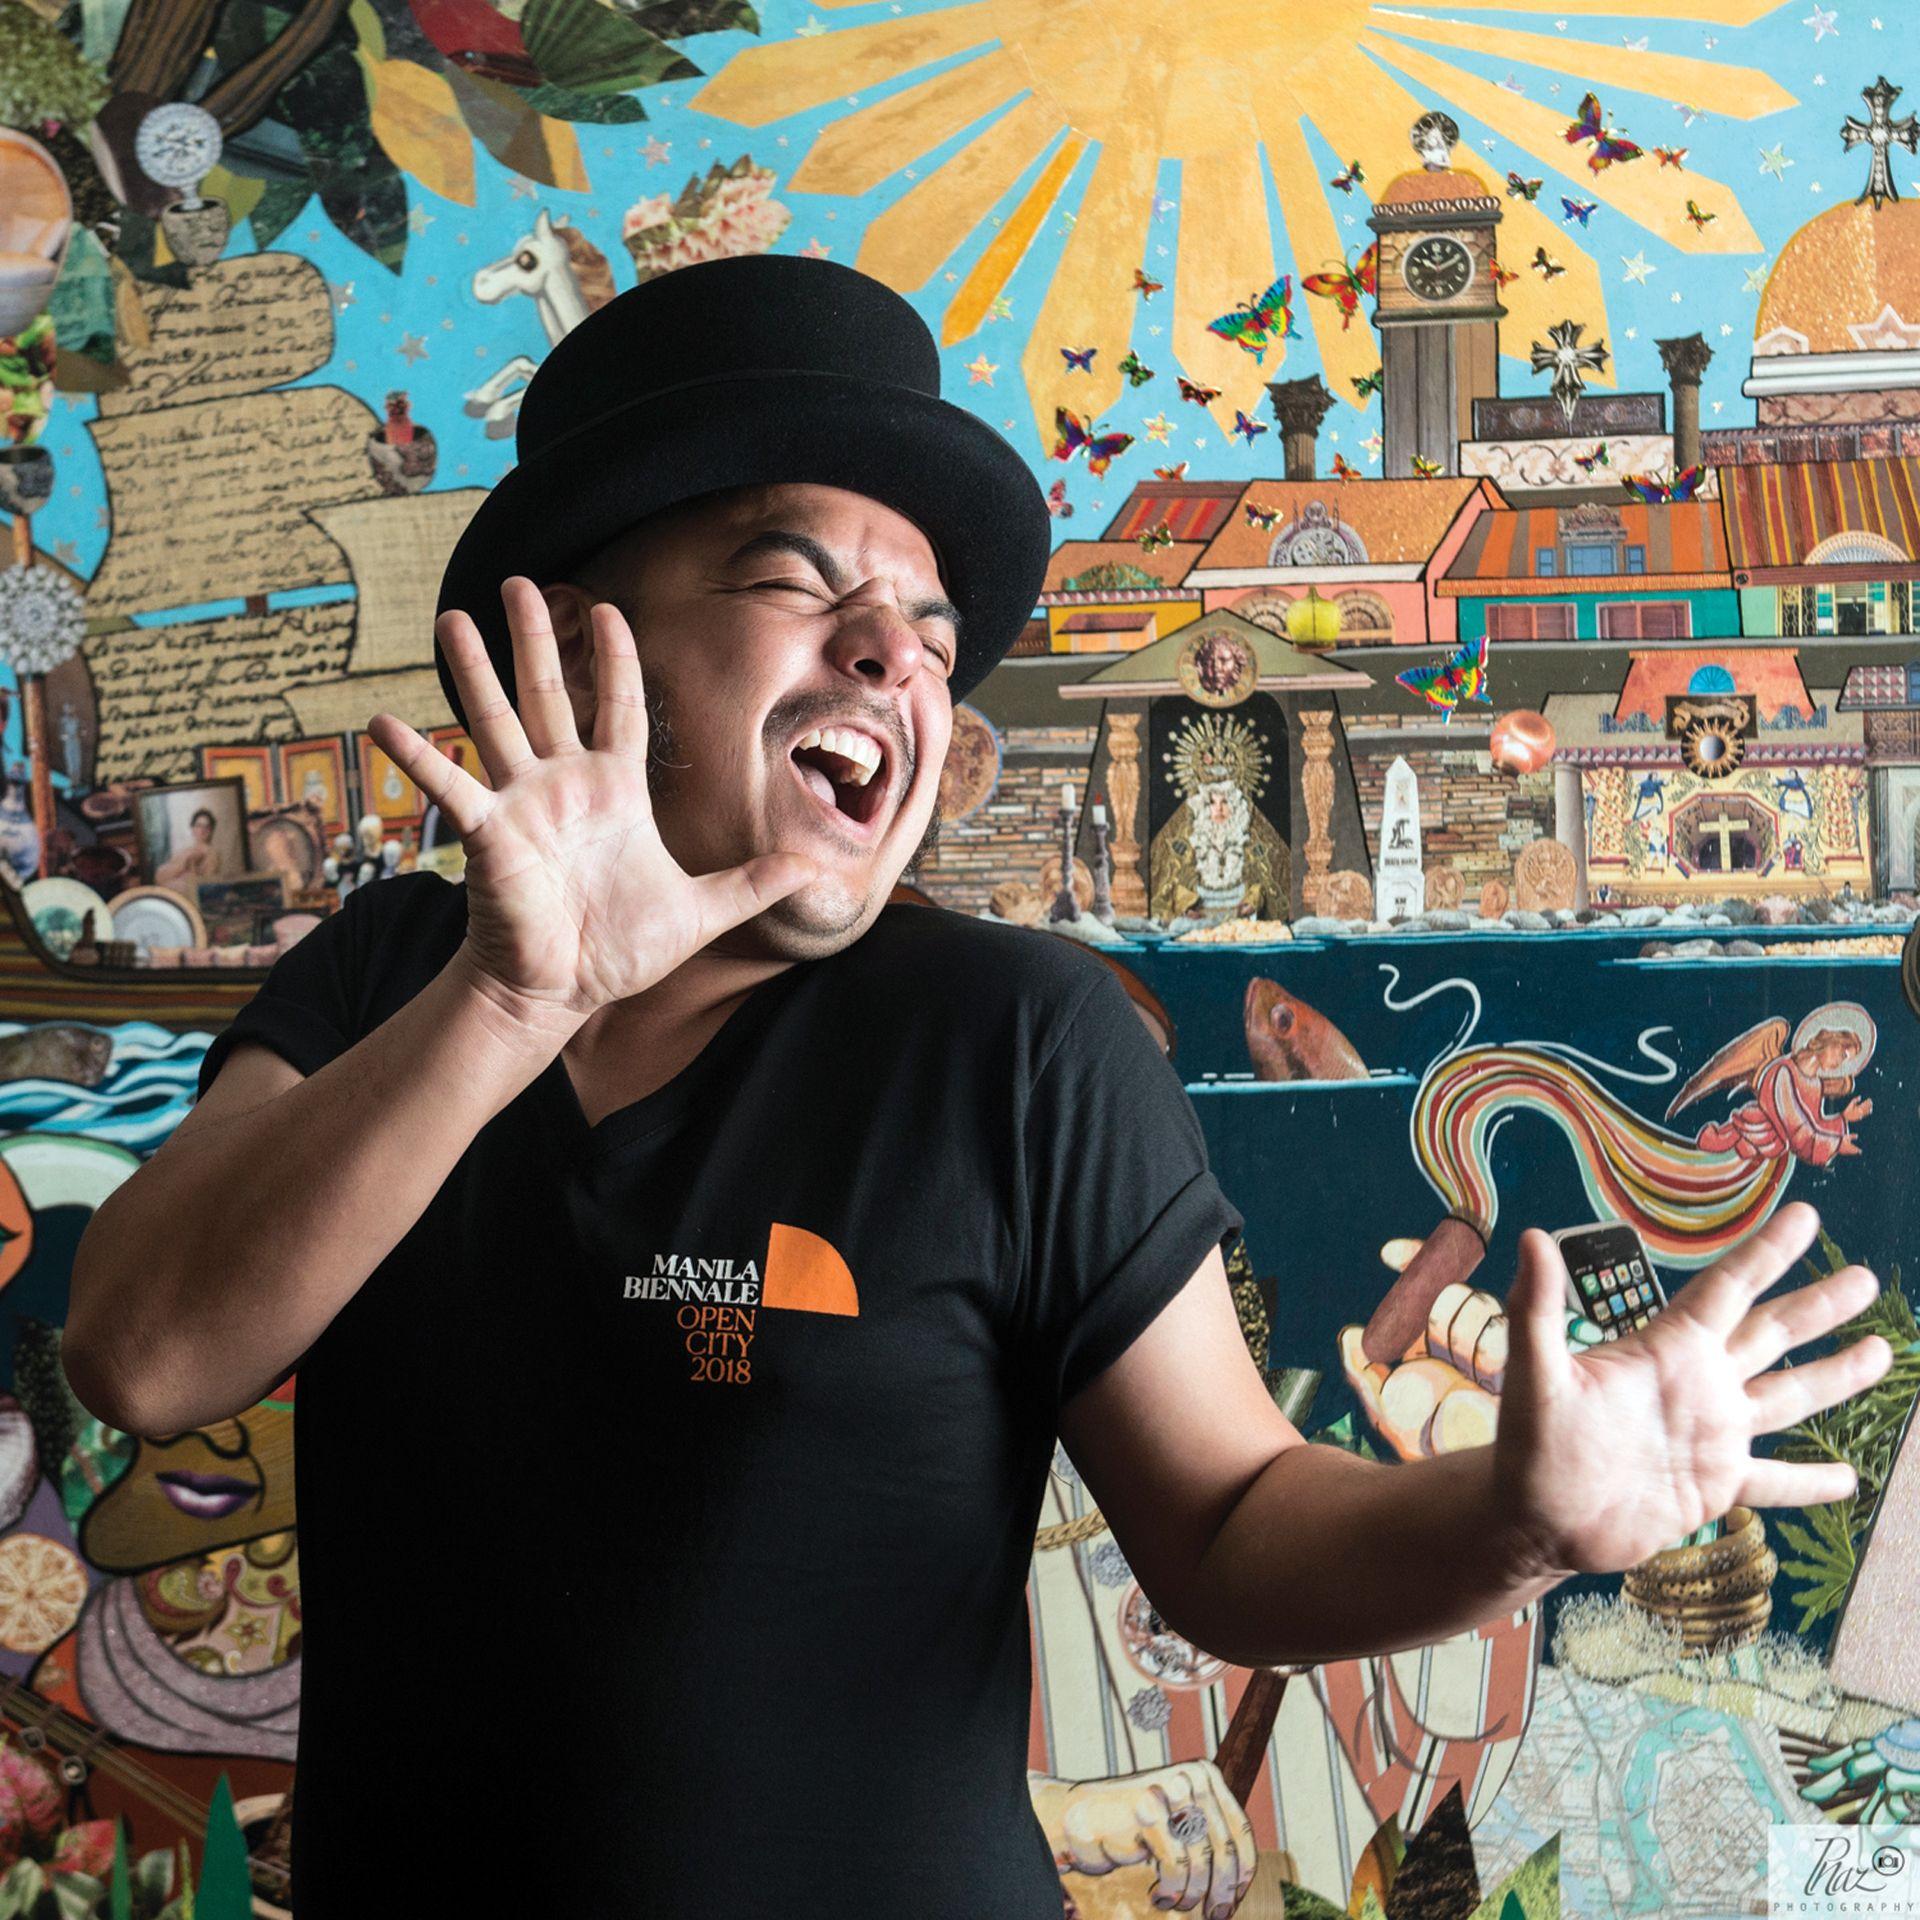 Carlos Celdran On The Manila Biennale